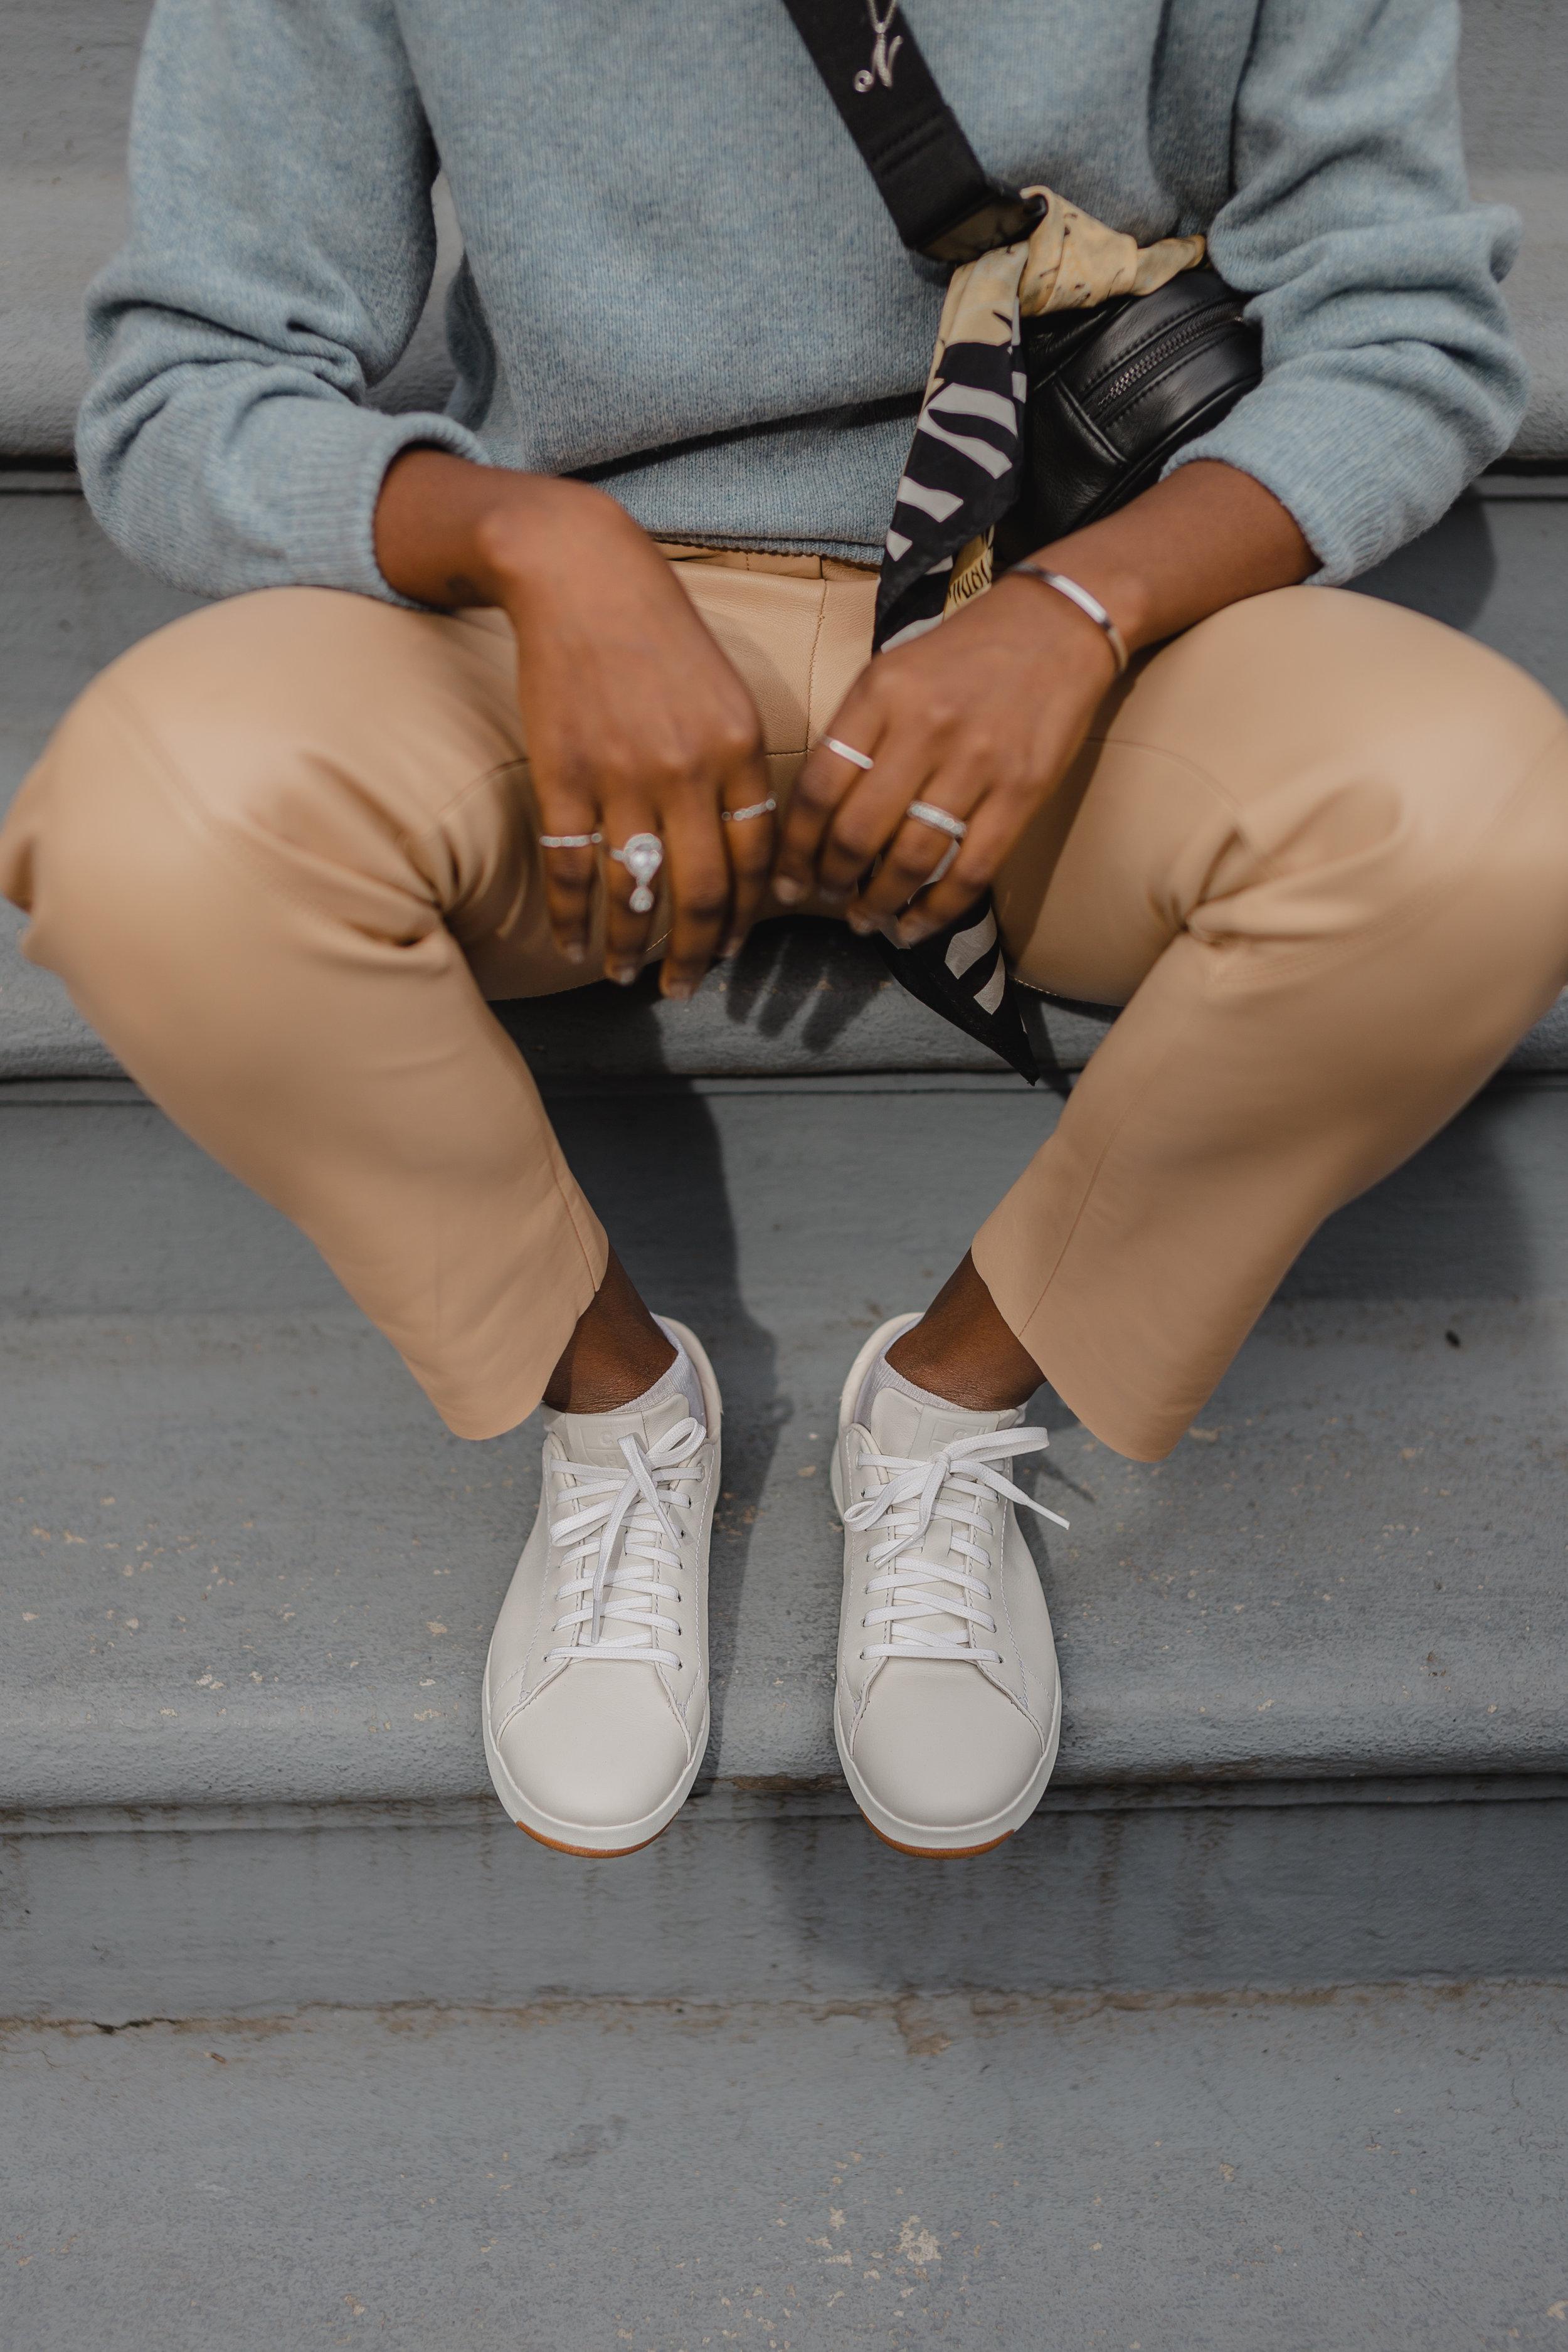 Grandprø Tennis Sneaker  / Size 9 / True to size